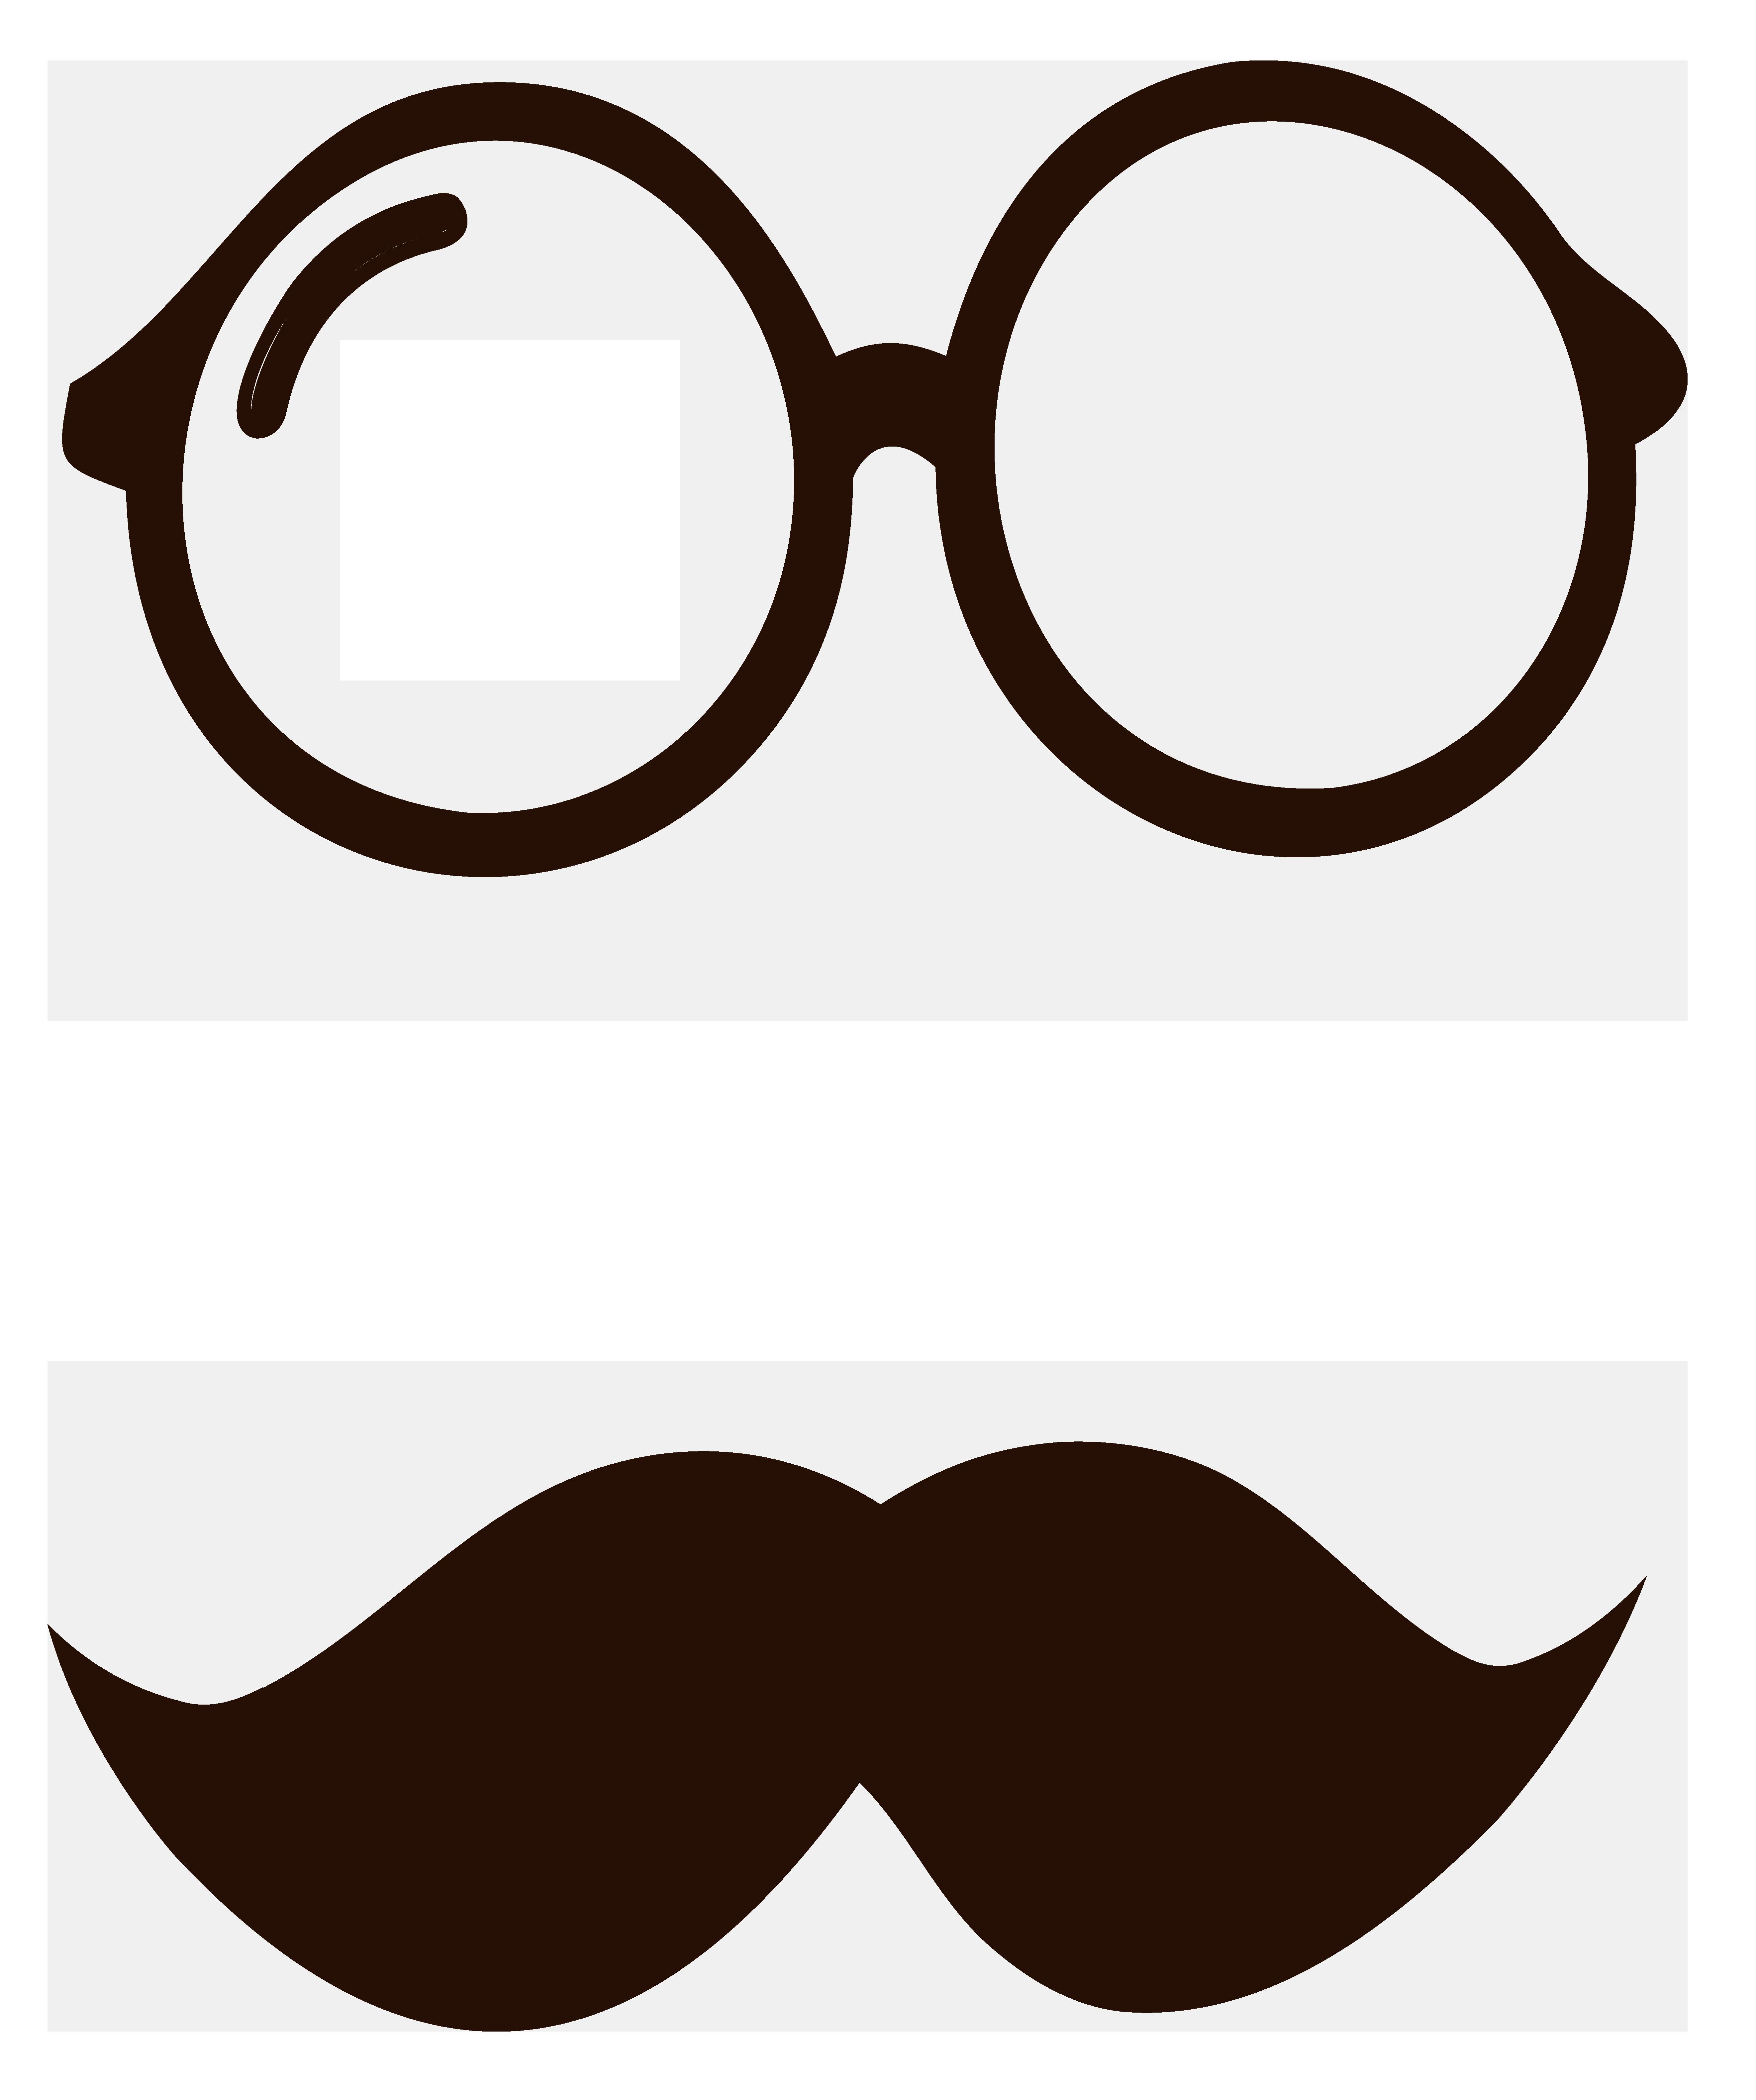 clipart girl glasses - photo #13